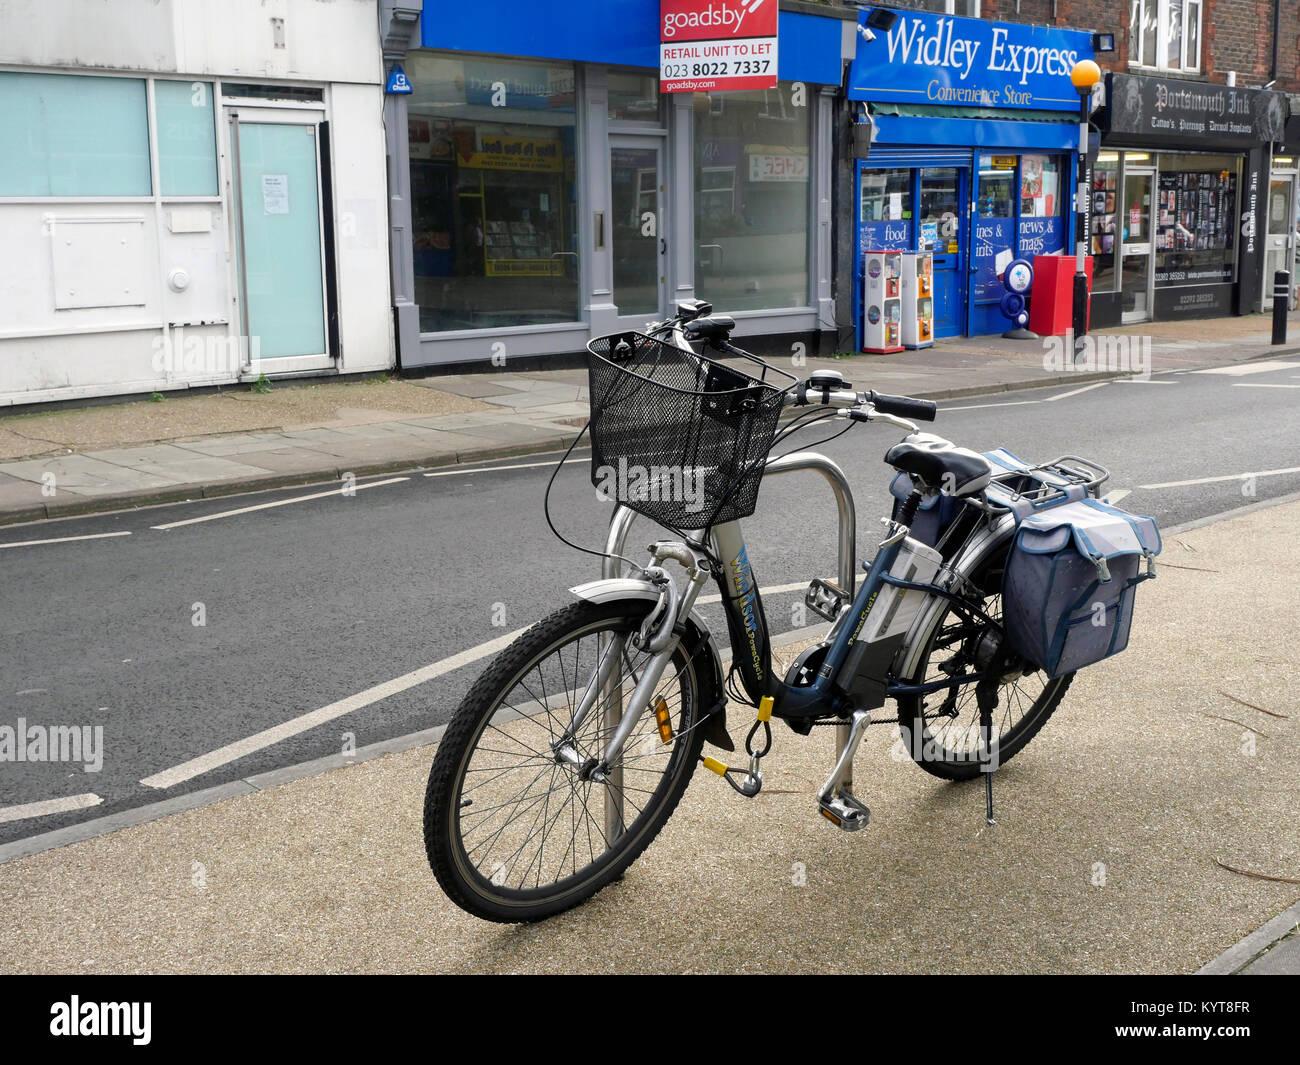 Electric assisted pedal bike on High Street, Cosham, Hampshire, England, UK Stock Photo